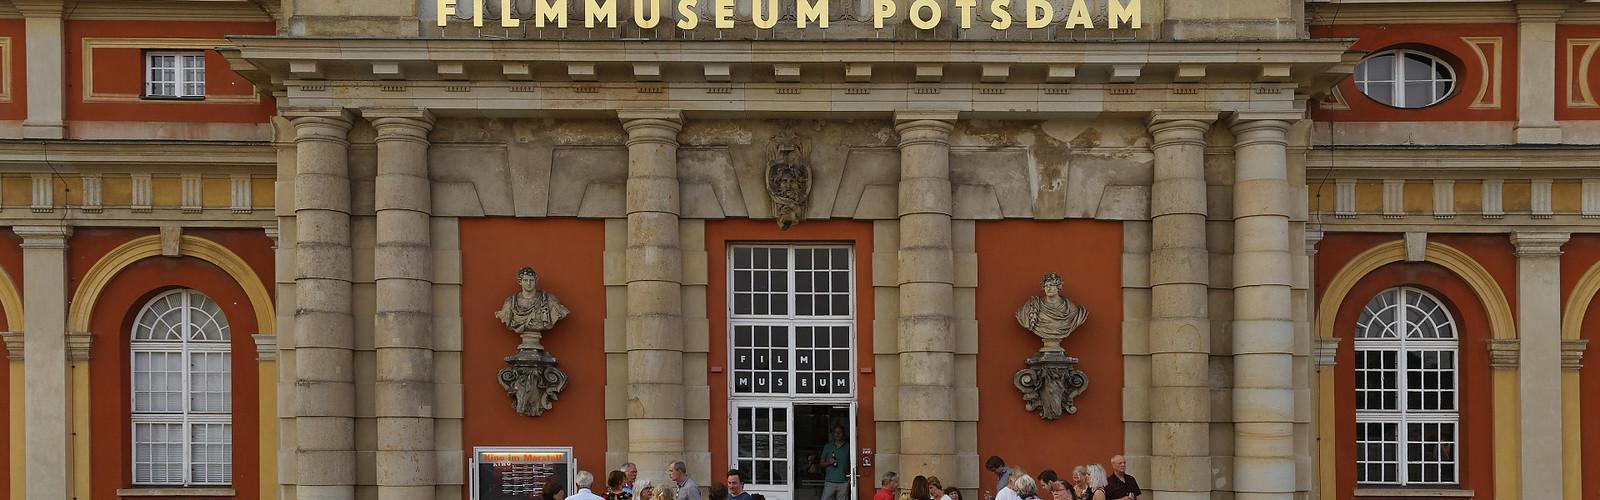 Filmmuseum Potsdam PMSG Andre Stiebitz